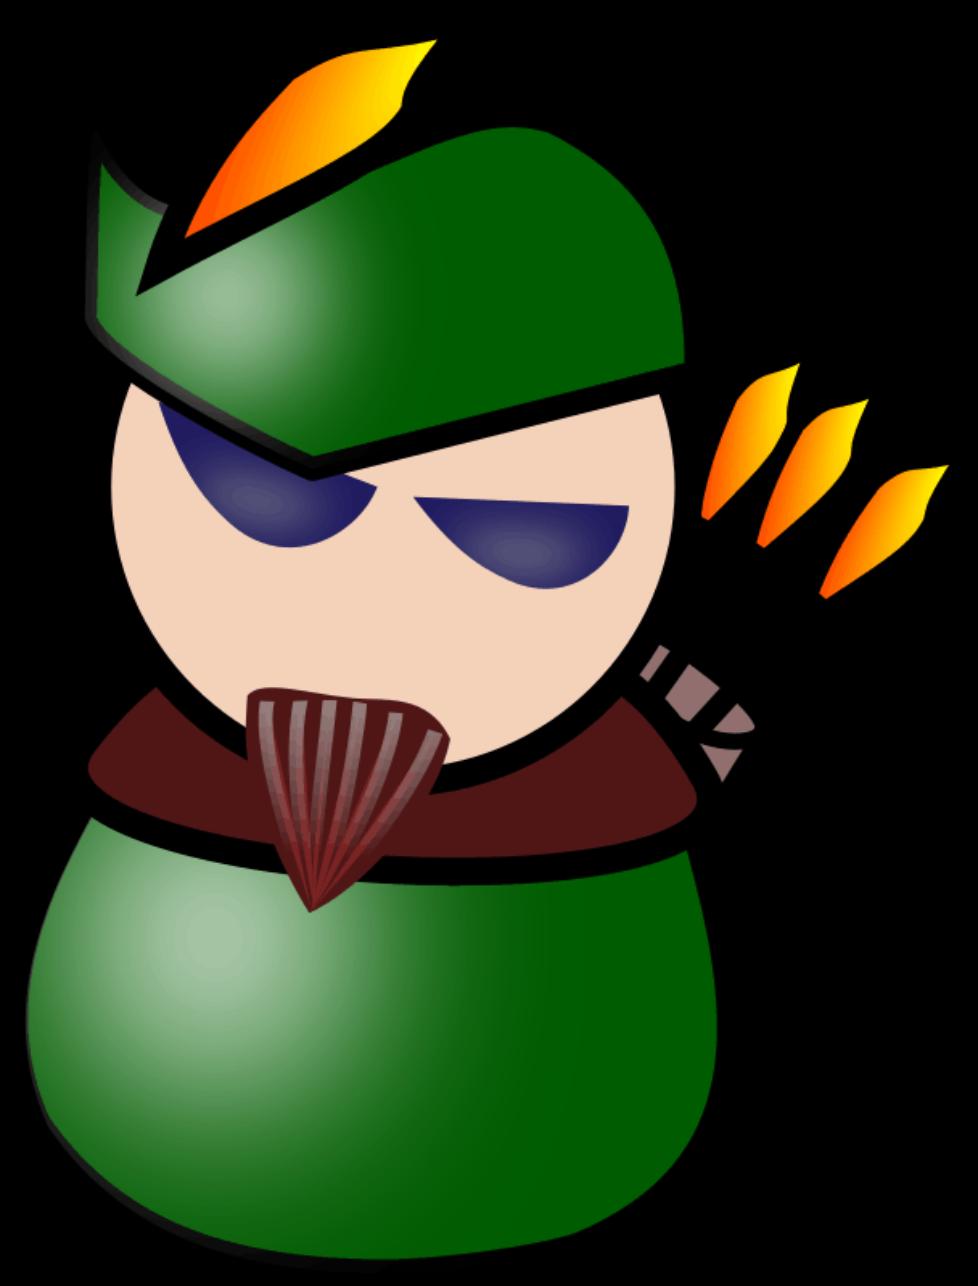 chovynz-OCAL-Userpic-RobinHood